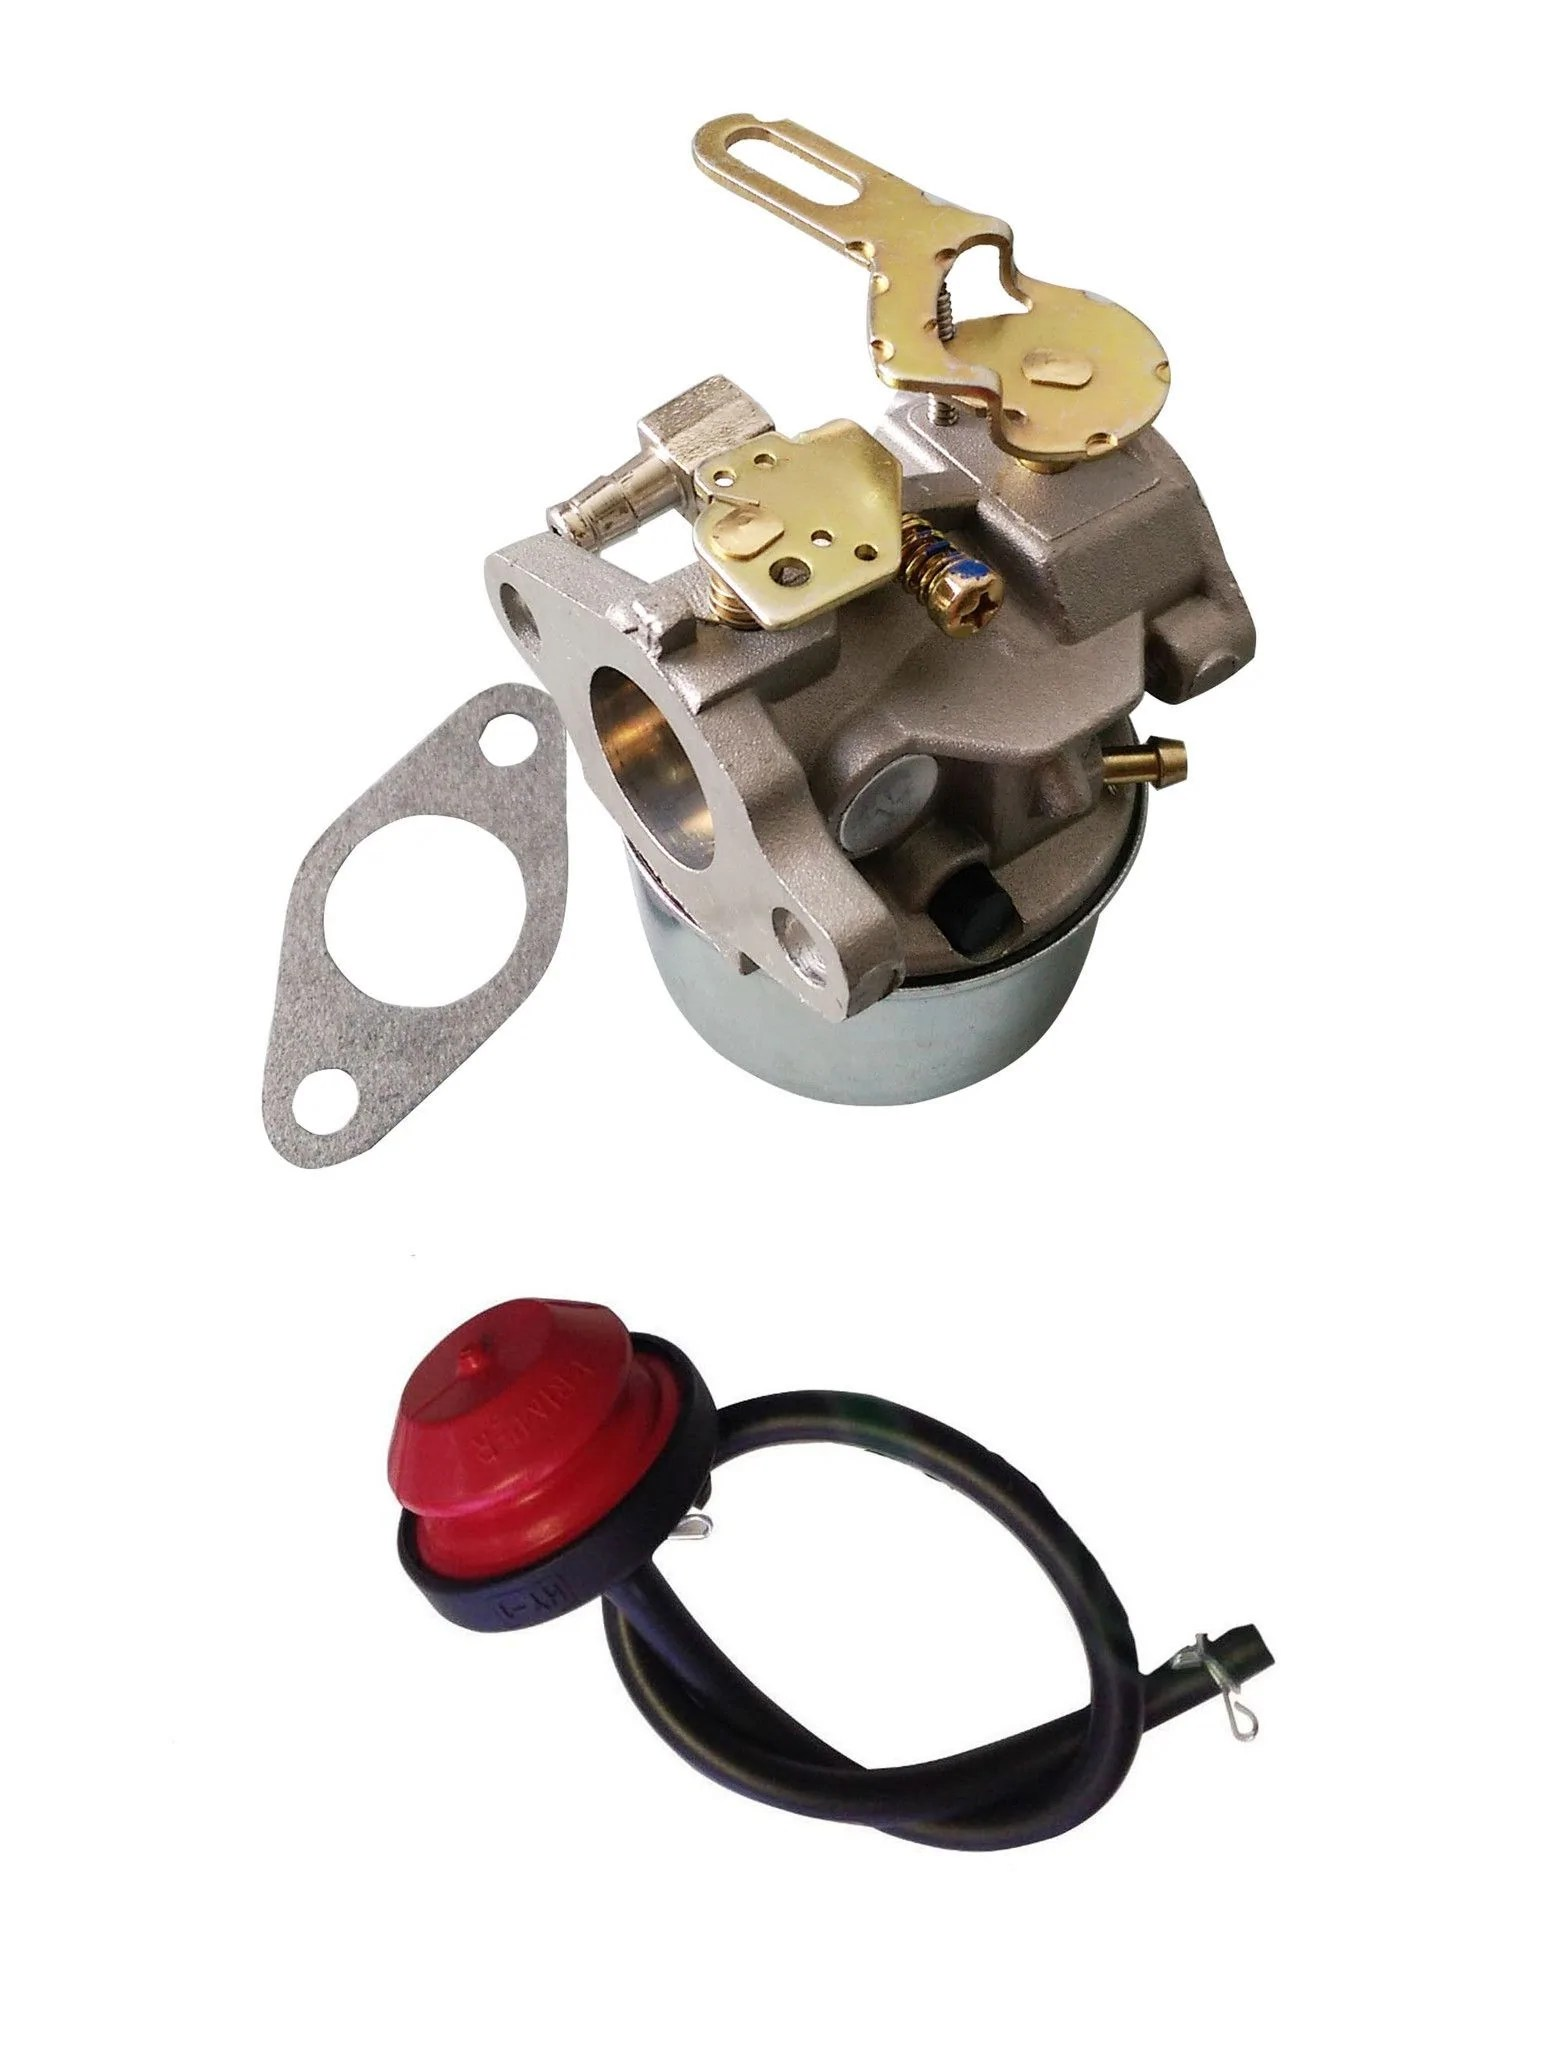 medium resolution of everest carburetor with primer bulb fits toro snowblower usa everest parts supplies